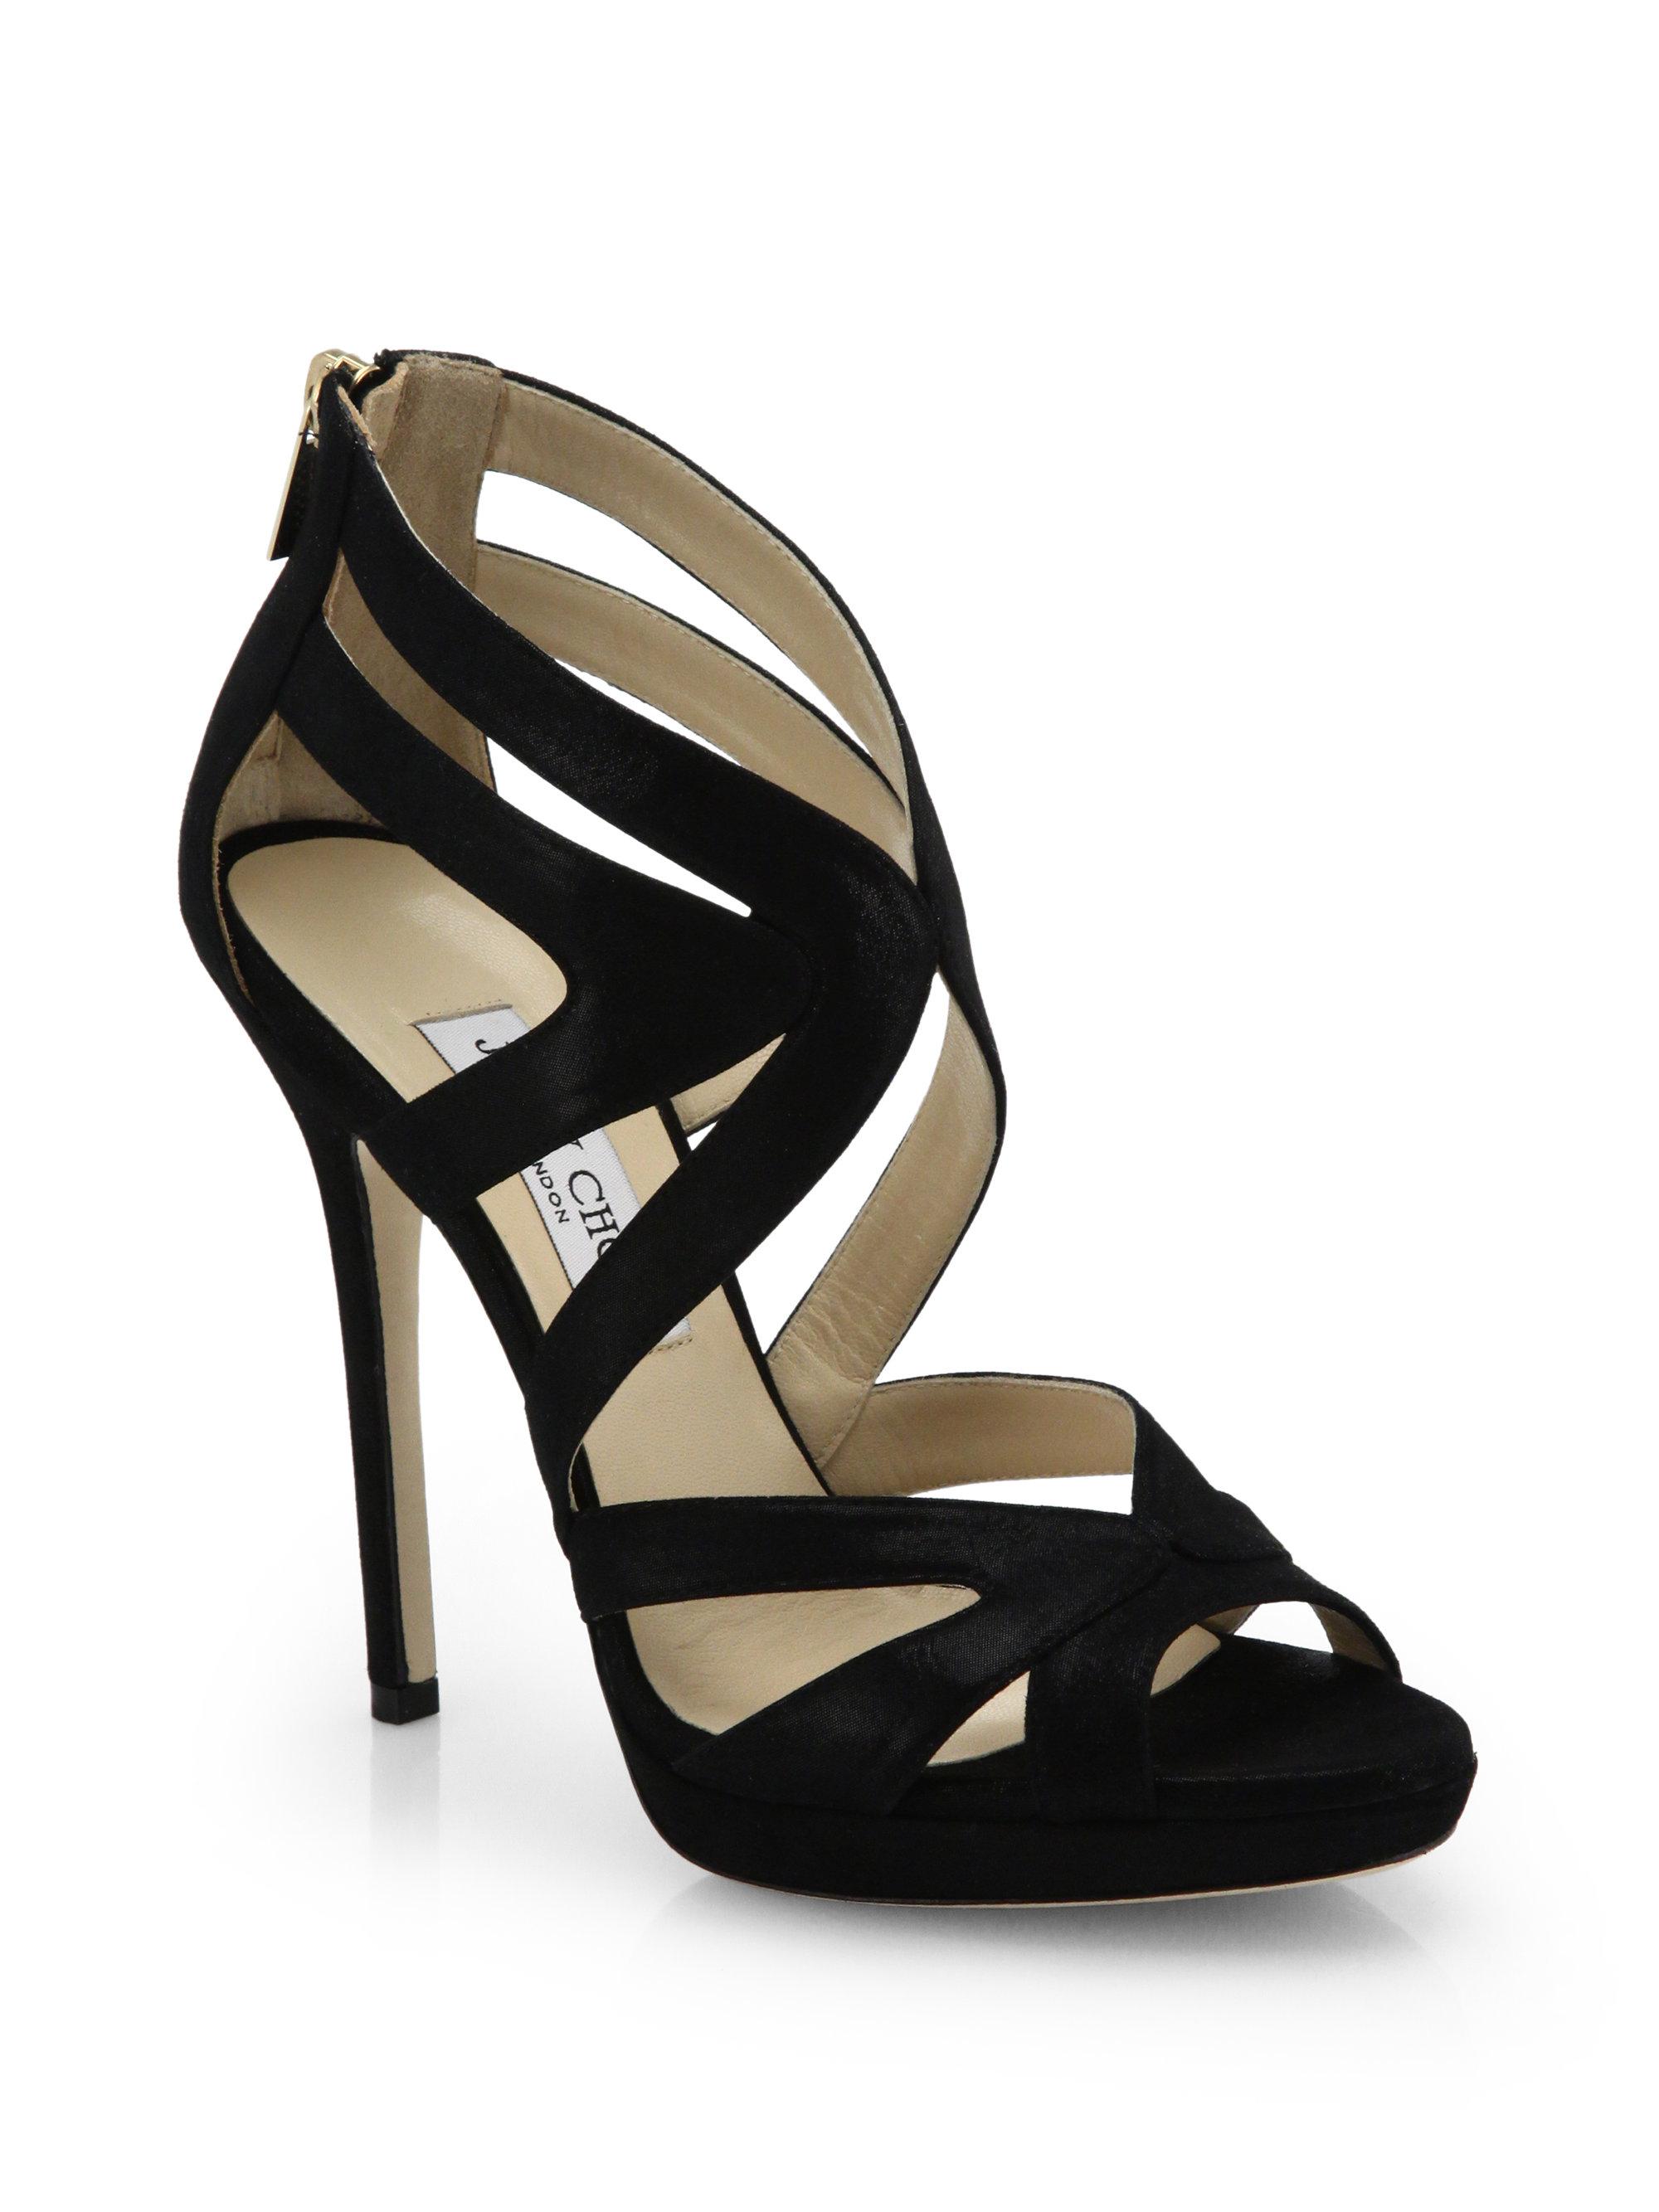 714b121fb30 ... order lyst jimmy choo collar shimmer suede platform sandals in black  e372d 78d5a